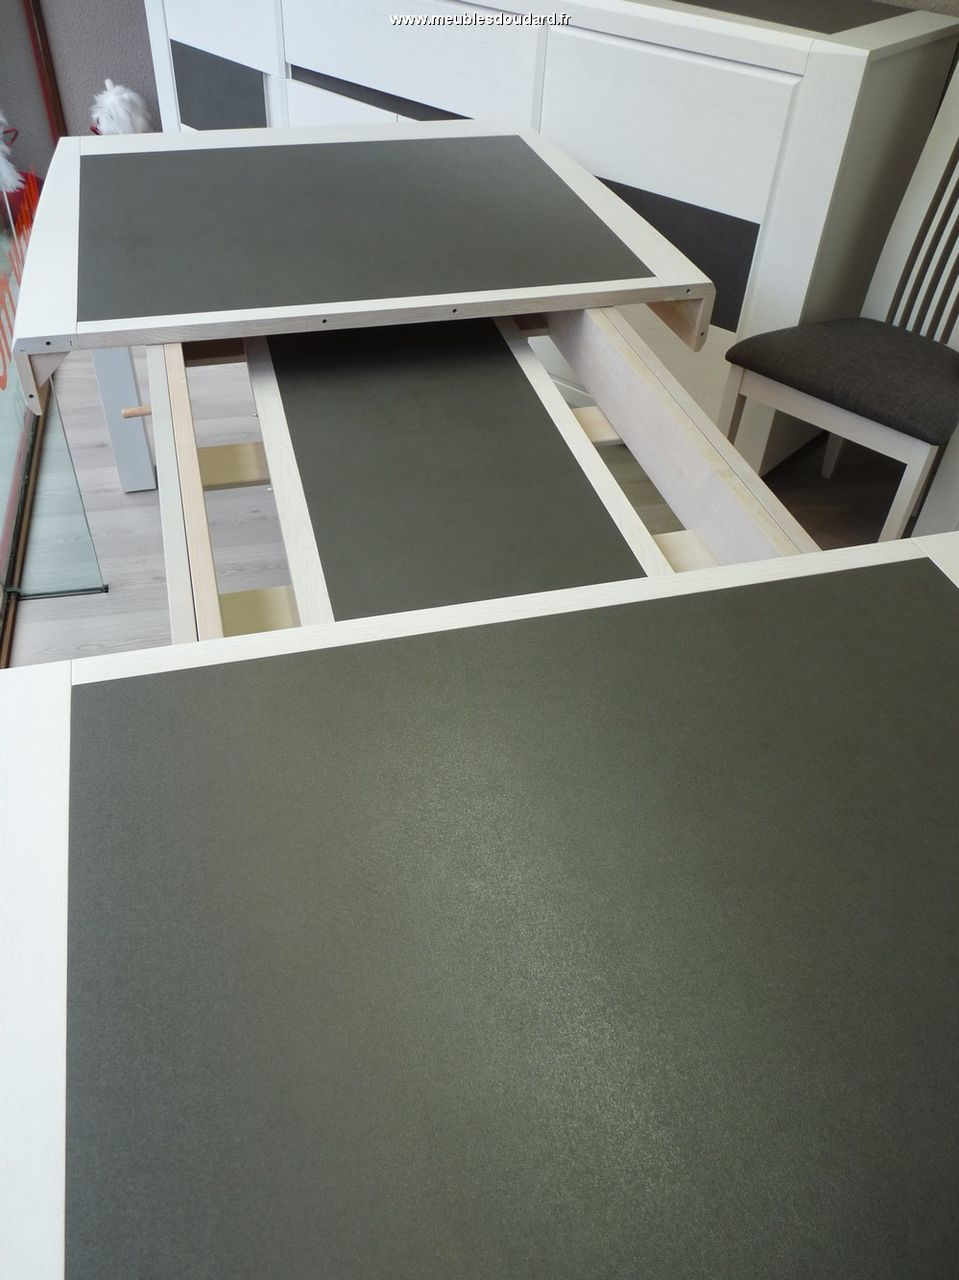 Table Rectangulaire Moderne Table Dessus Cramique Table